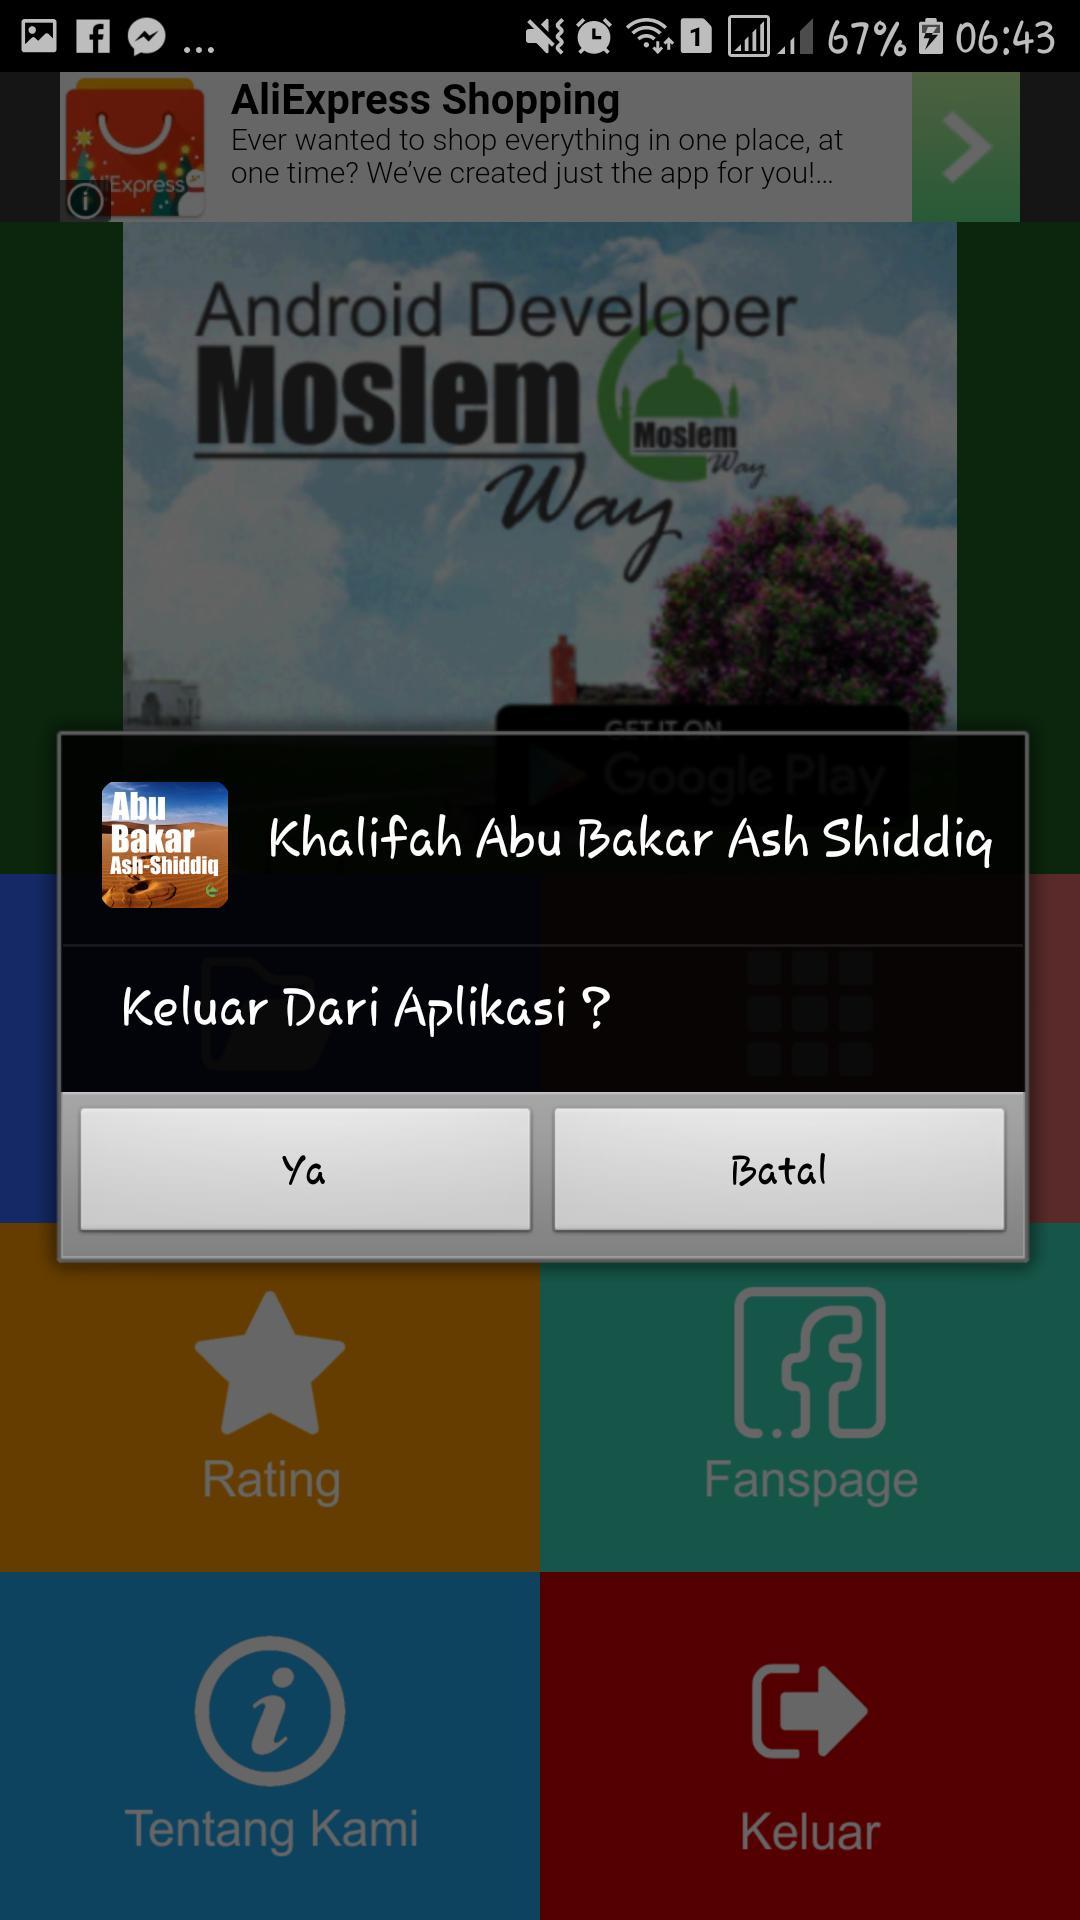 Khalifah Abu Bakar Ash Shiddiq poster